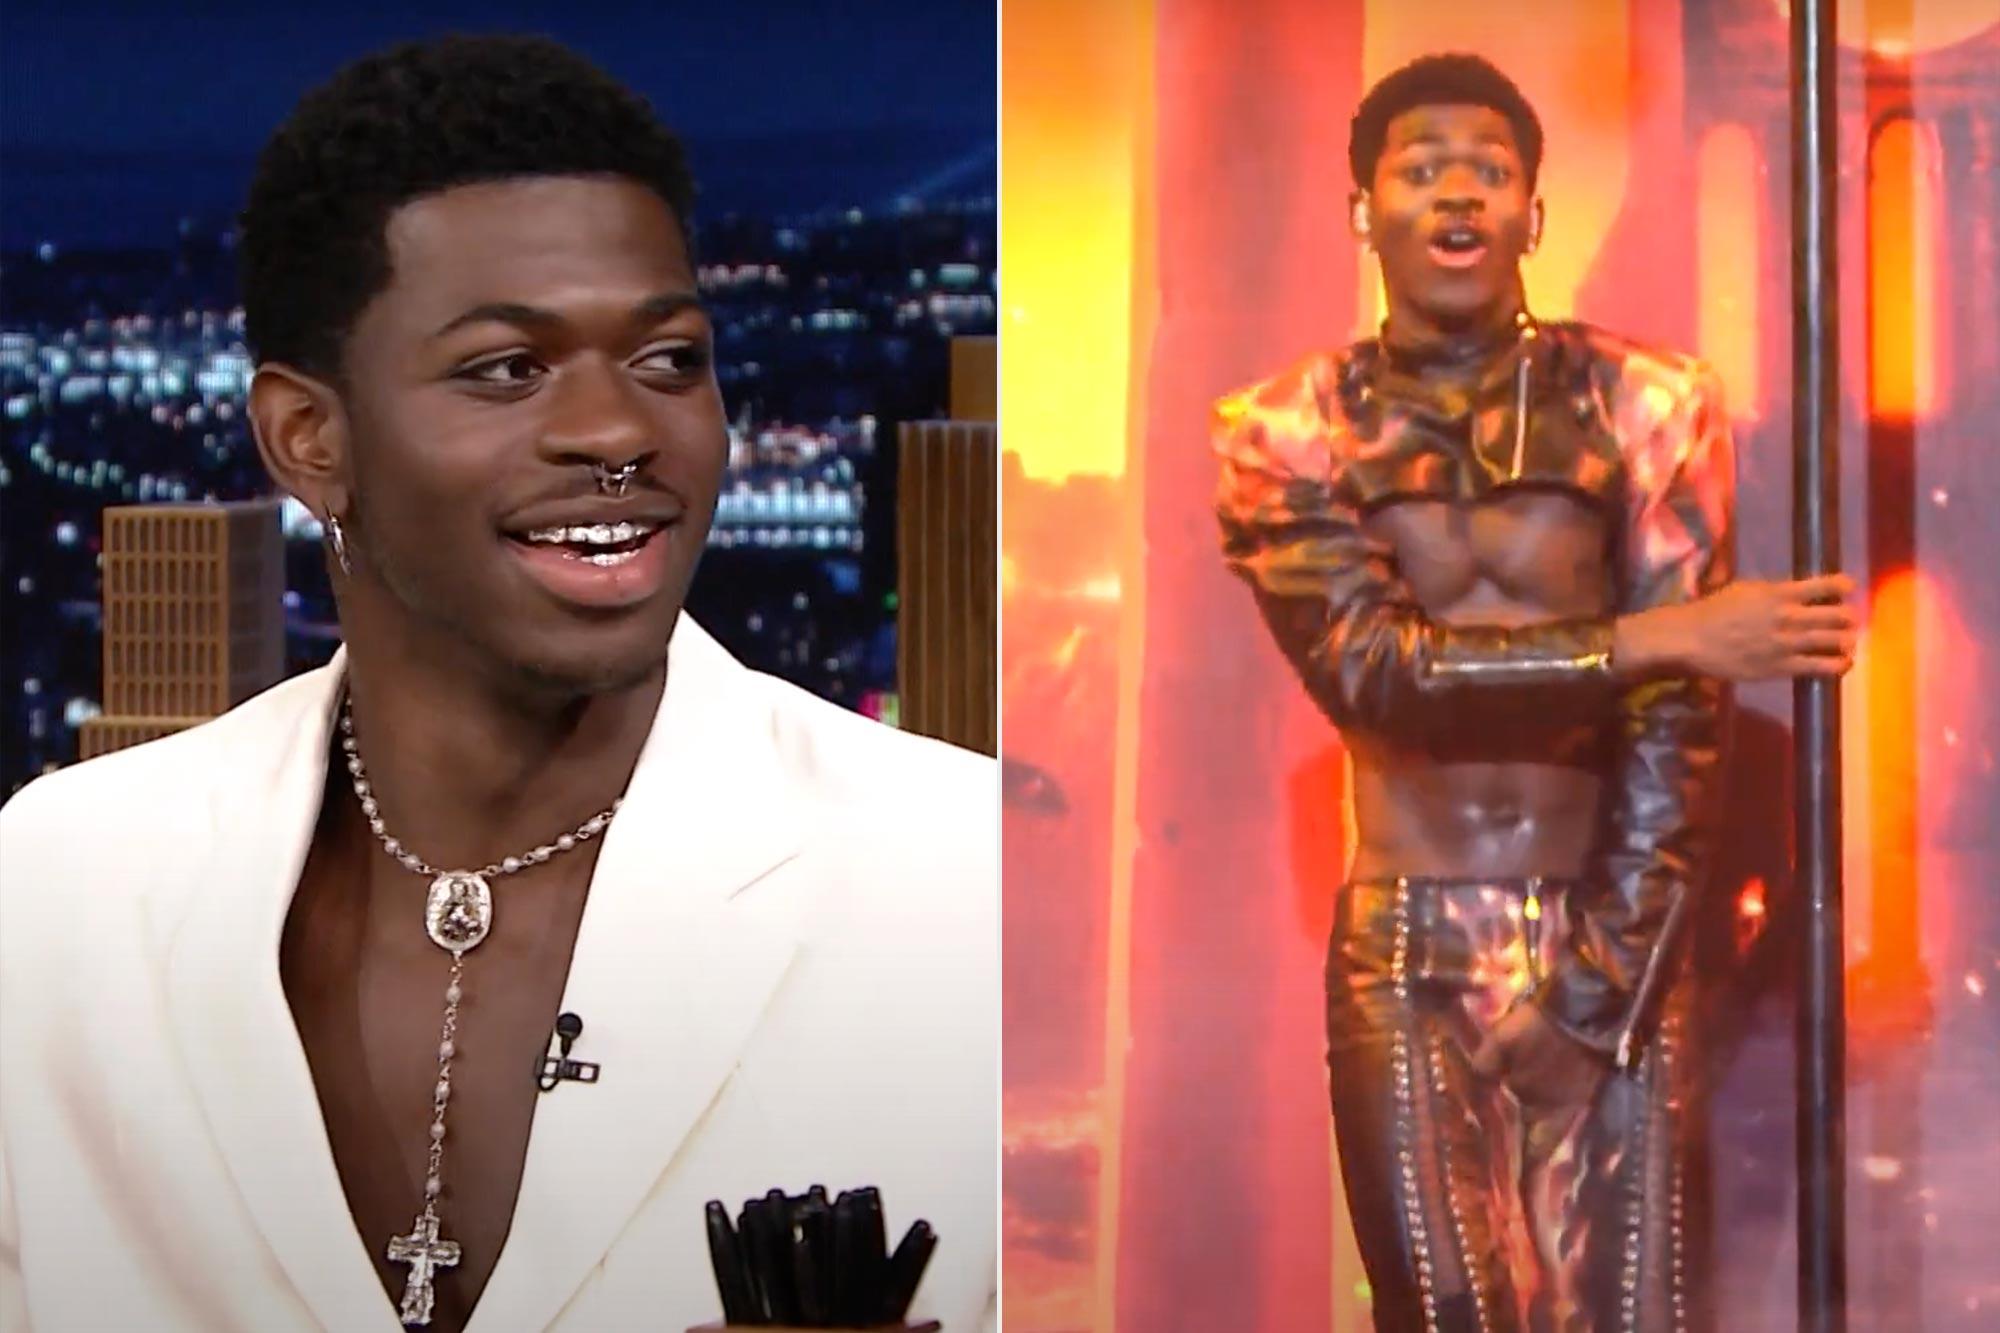 Lil Nas X Details His SNL Wardrobe Malfunction | The Tonight Show Starring Jimmy Fallon